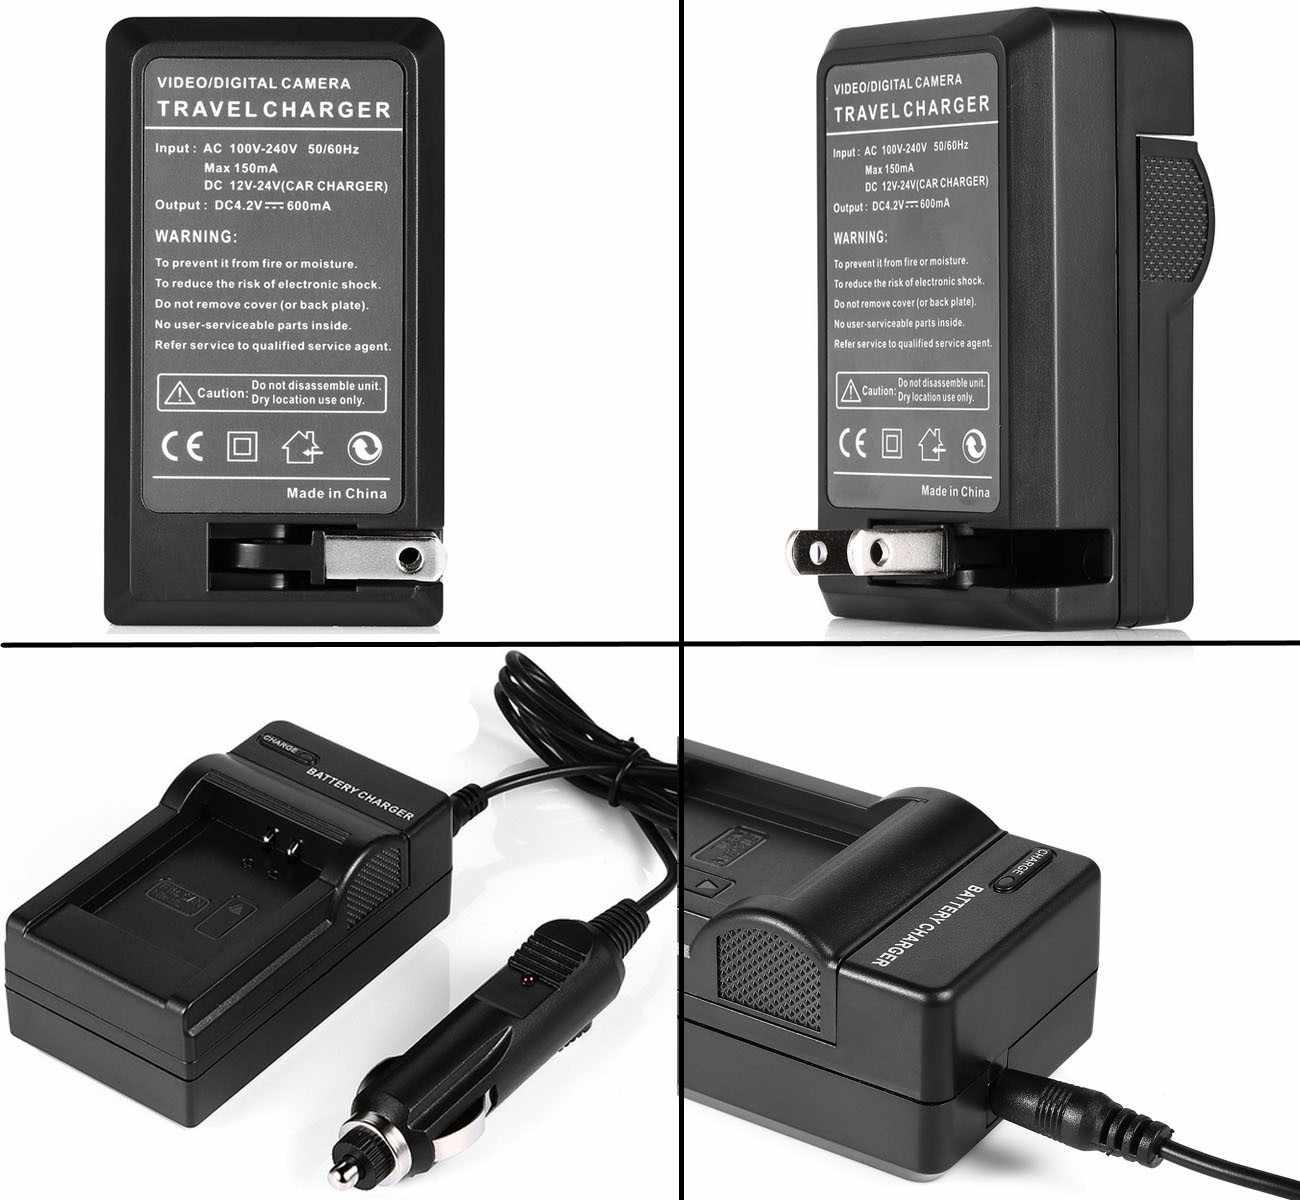 DCR-SX45E DCR-SX21E DCR-SX22E Battery Charger for Sony DCR-SX20E DCR-SX44E DCR-SX34E DCR-SX65E DCR-SX85E Handycam Camcorder